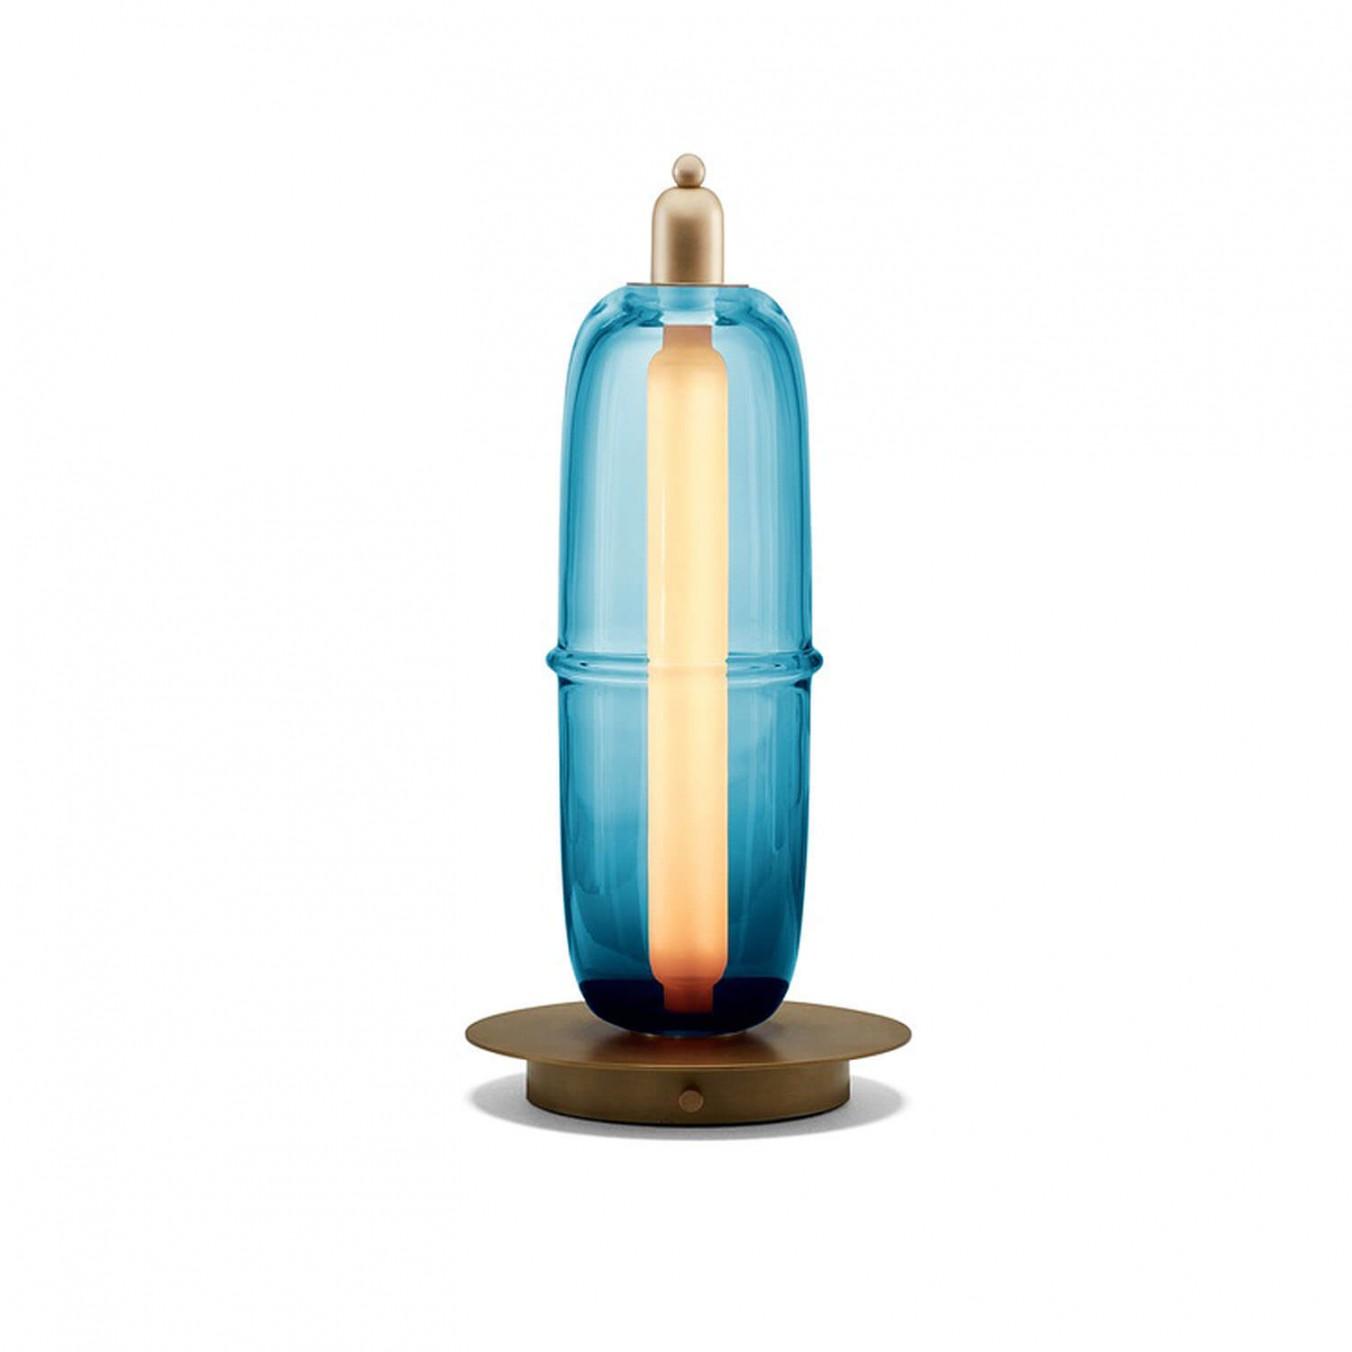 Moirai Table Lamp Version C